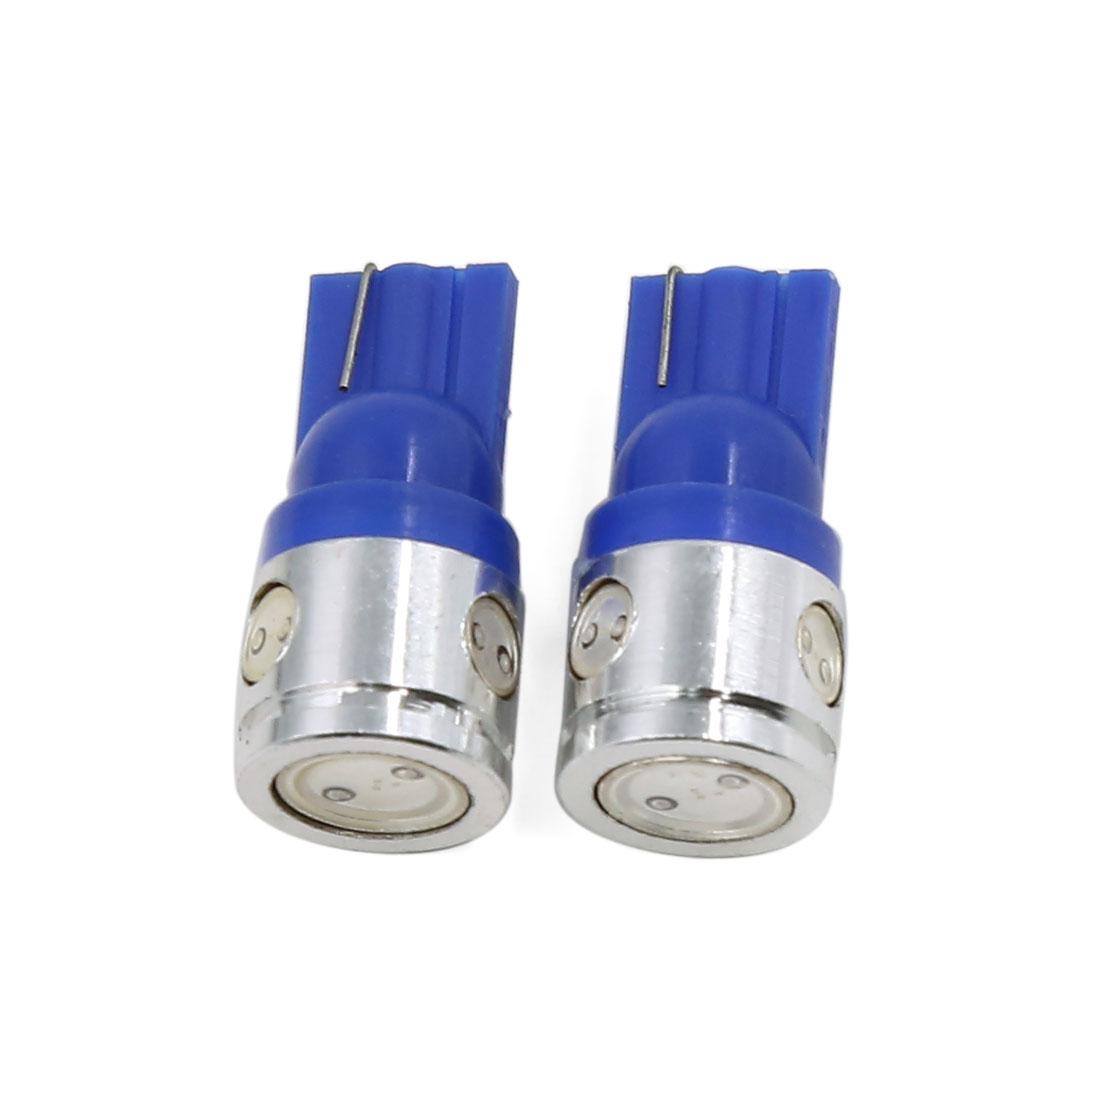 2 Pcs T10 Blue 2.5W High Power LED Bulbs Car Backup Reverse Light Lamp Interior